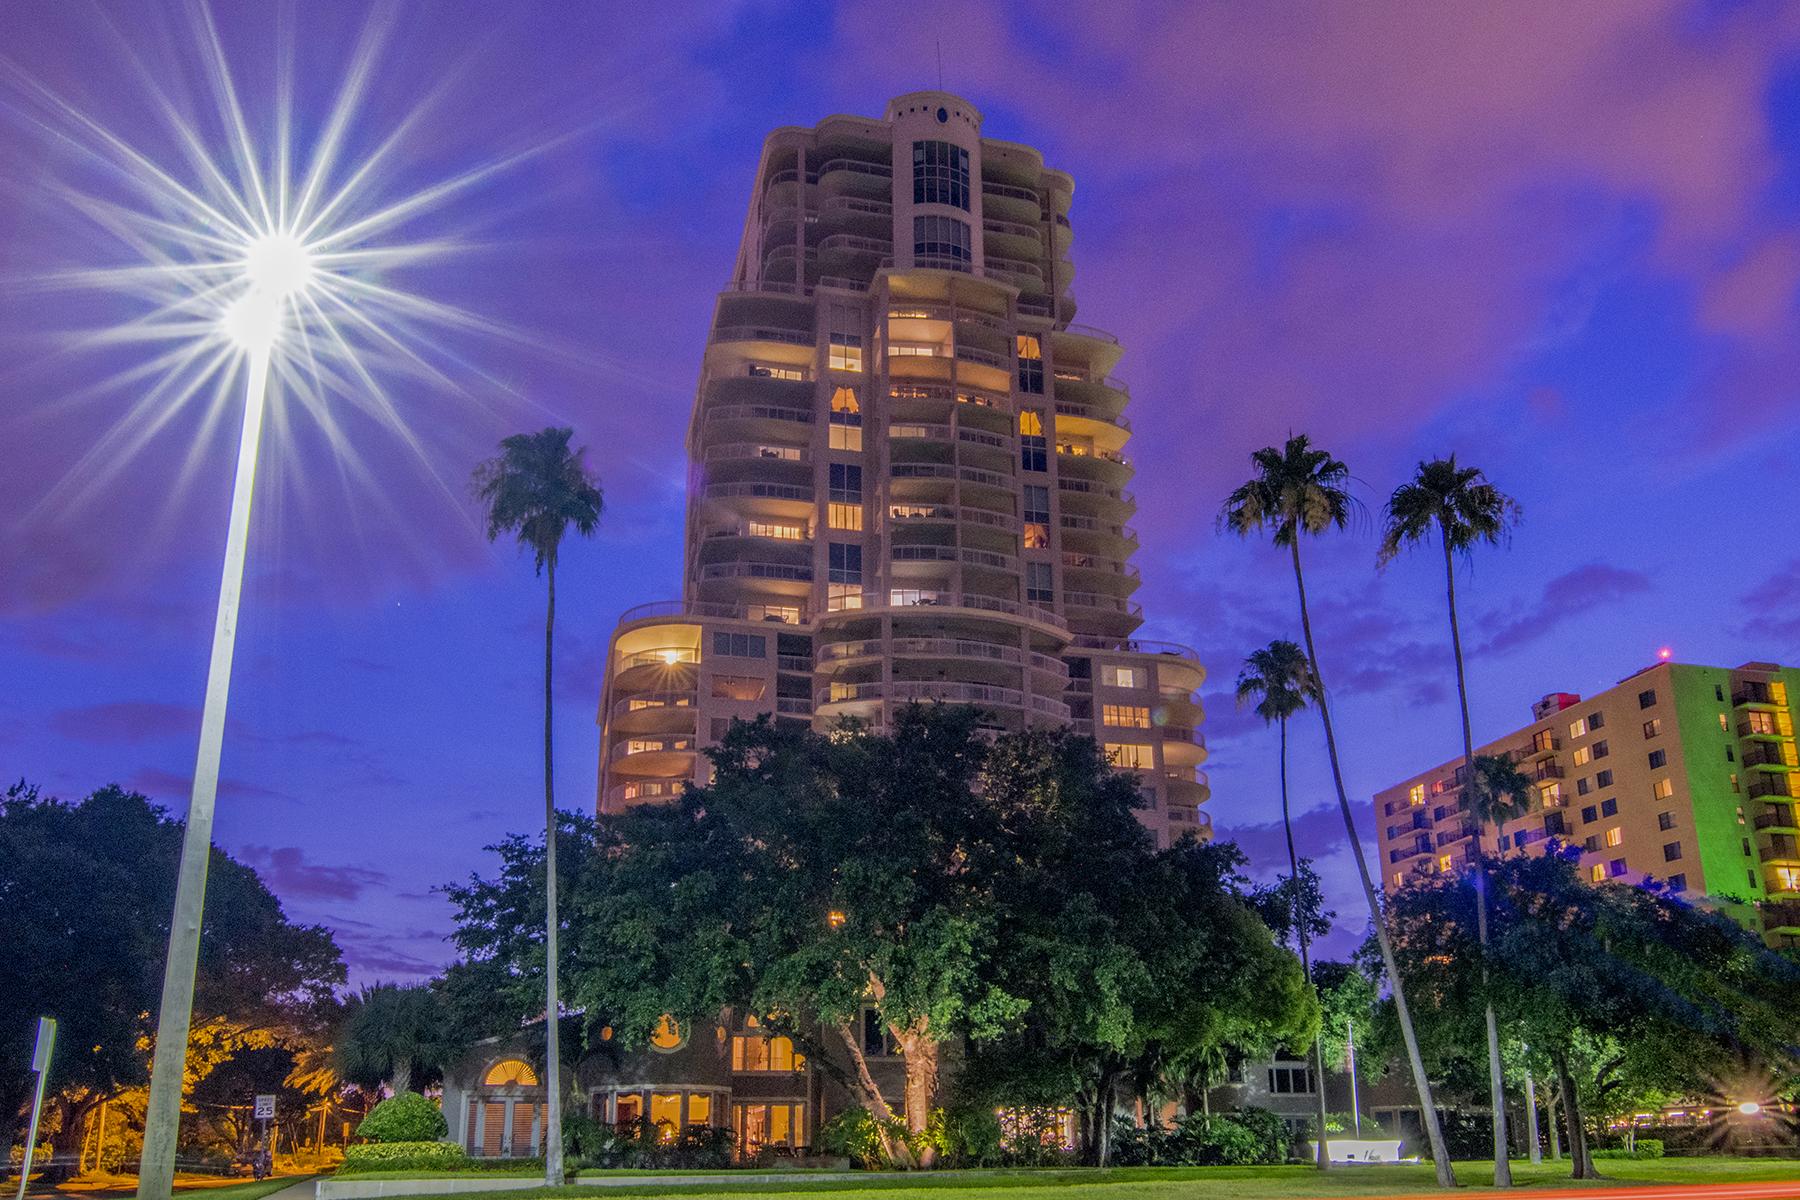 Condomínio para Venda às SOUTH TAMPA 3507 Bayshore Blvd 601 Tampa, Florida, 33629 Estados Unidos